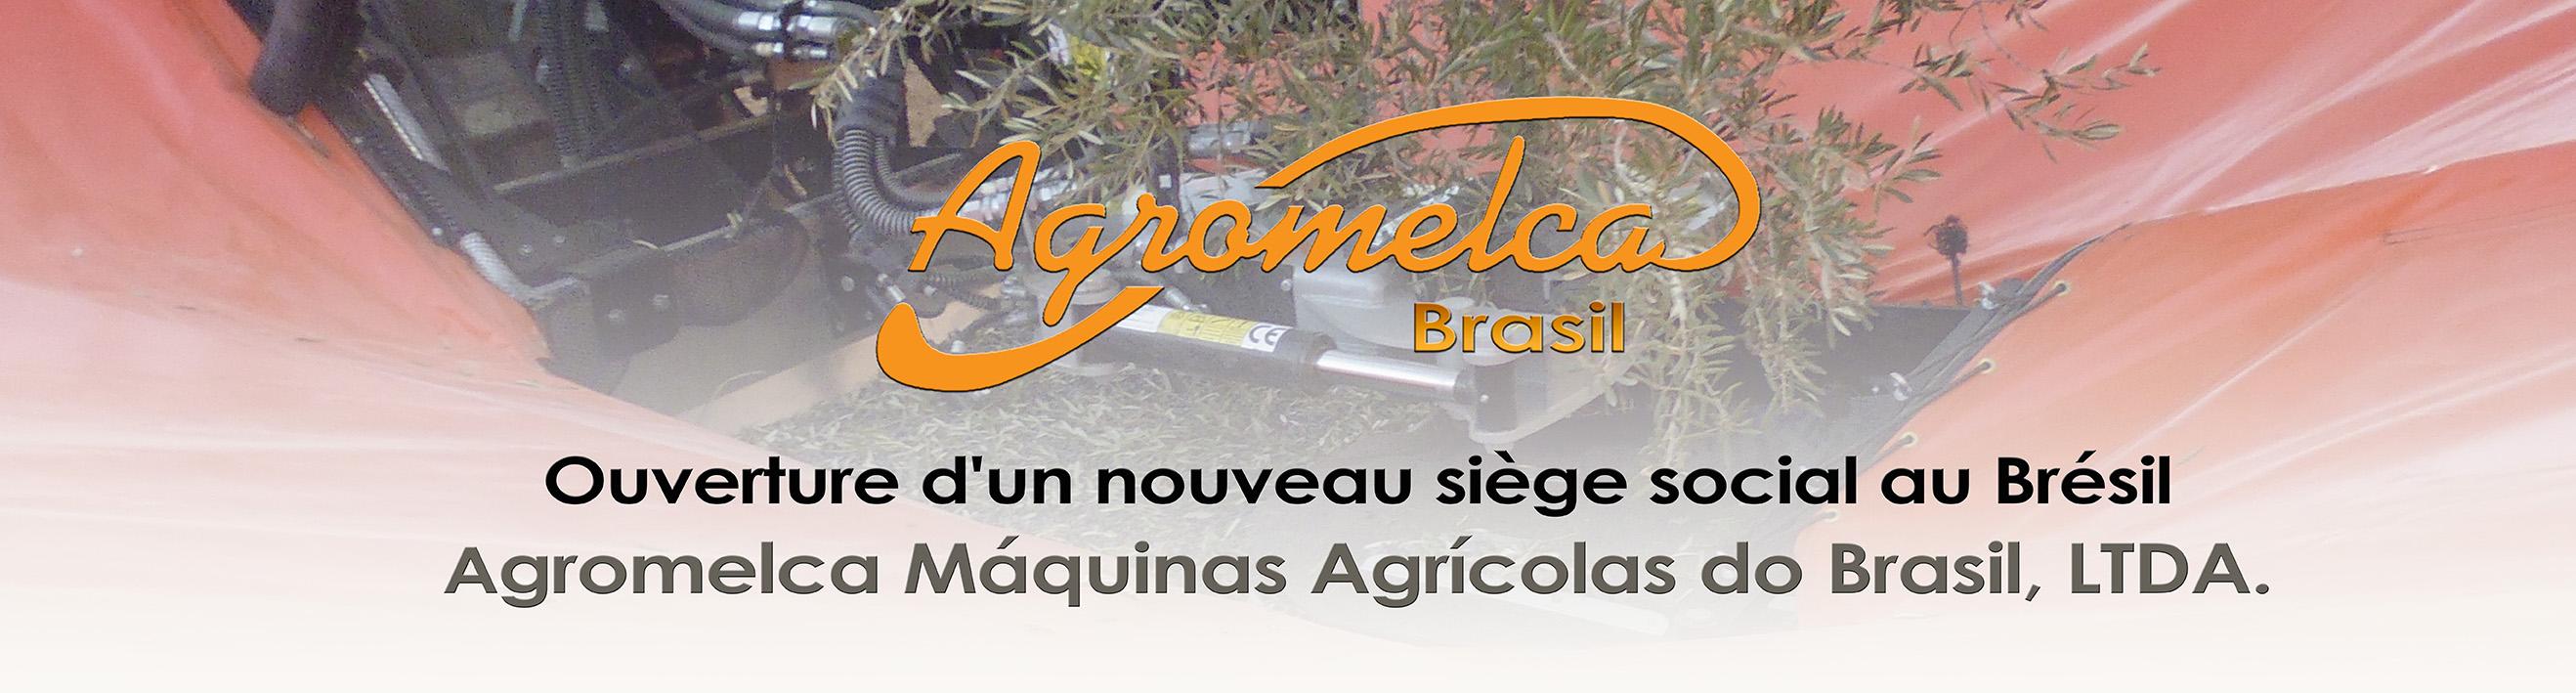 equipos_recolectores_de_aceituna_y_frutos_secos_agromelca_en_brasil_frances-banner